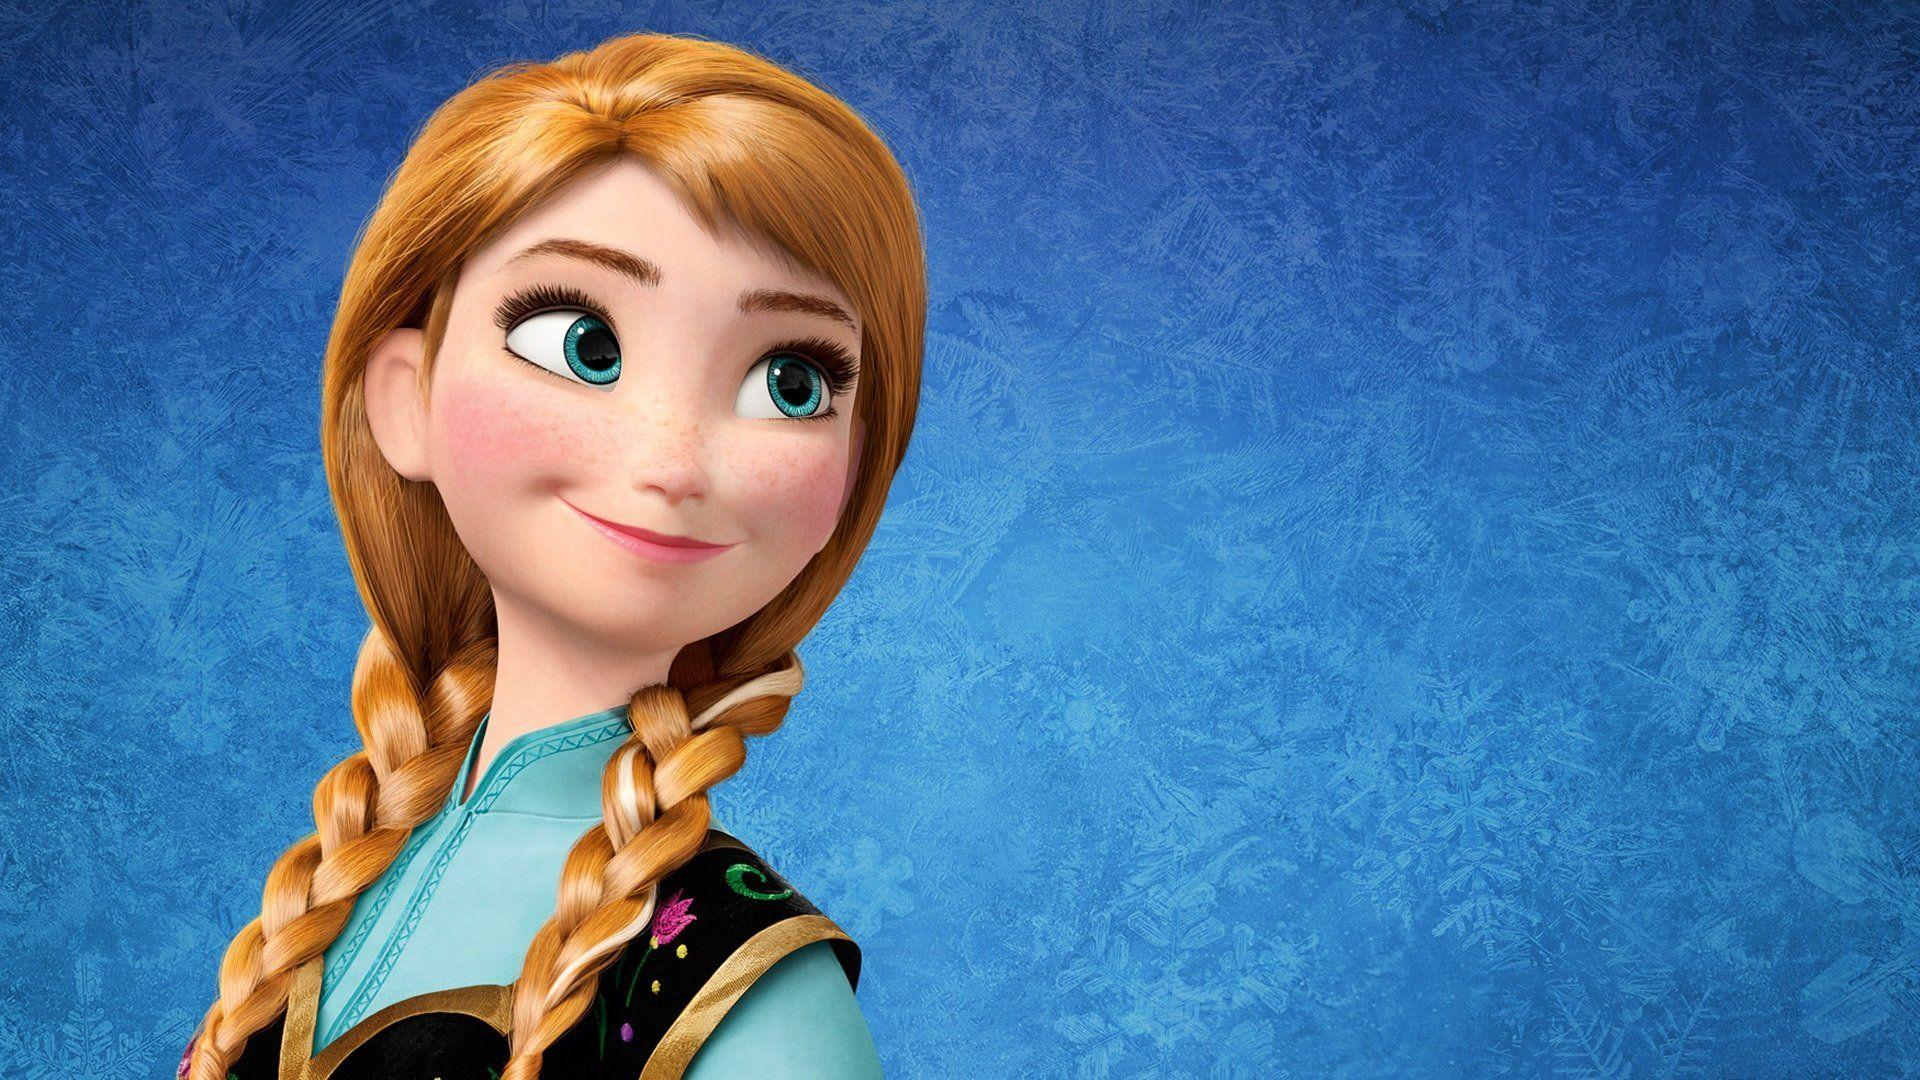 Elsa And Anna Wallpapers - Wallpaper Cave